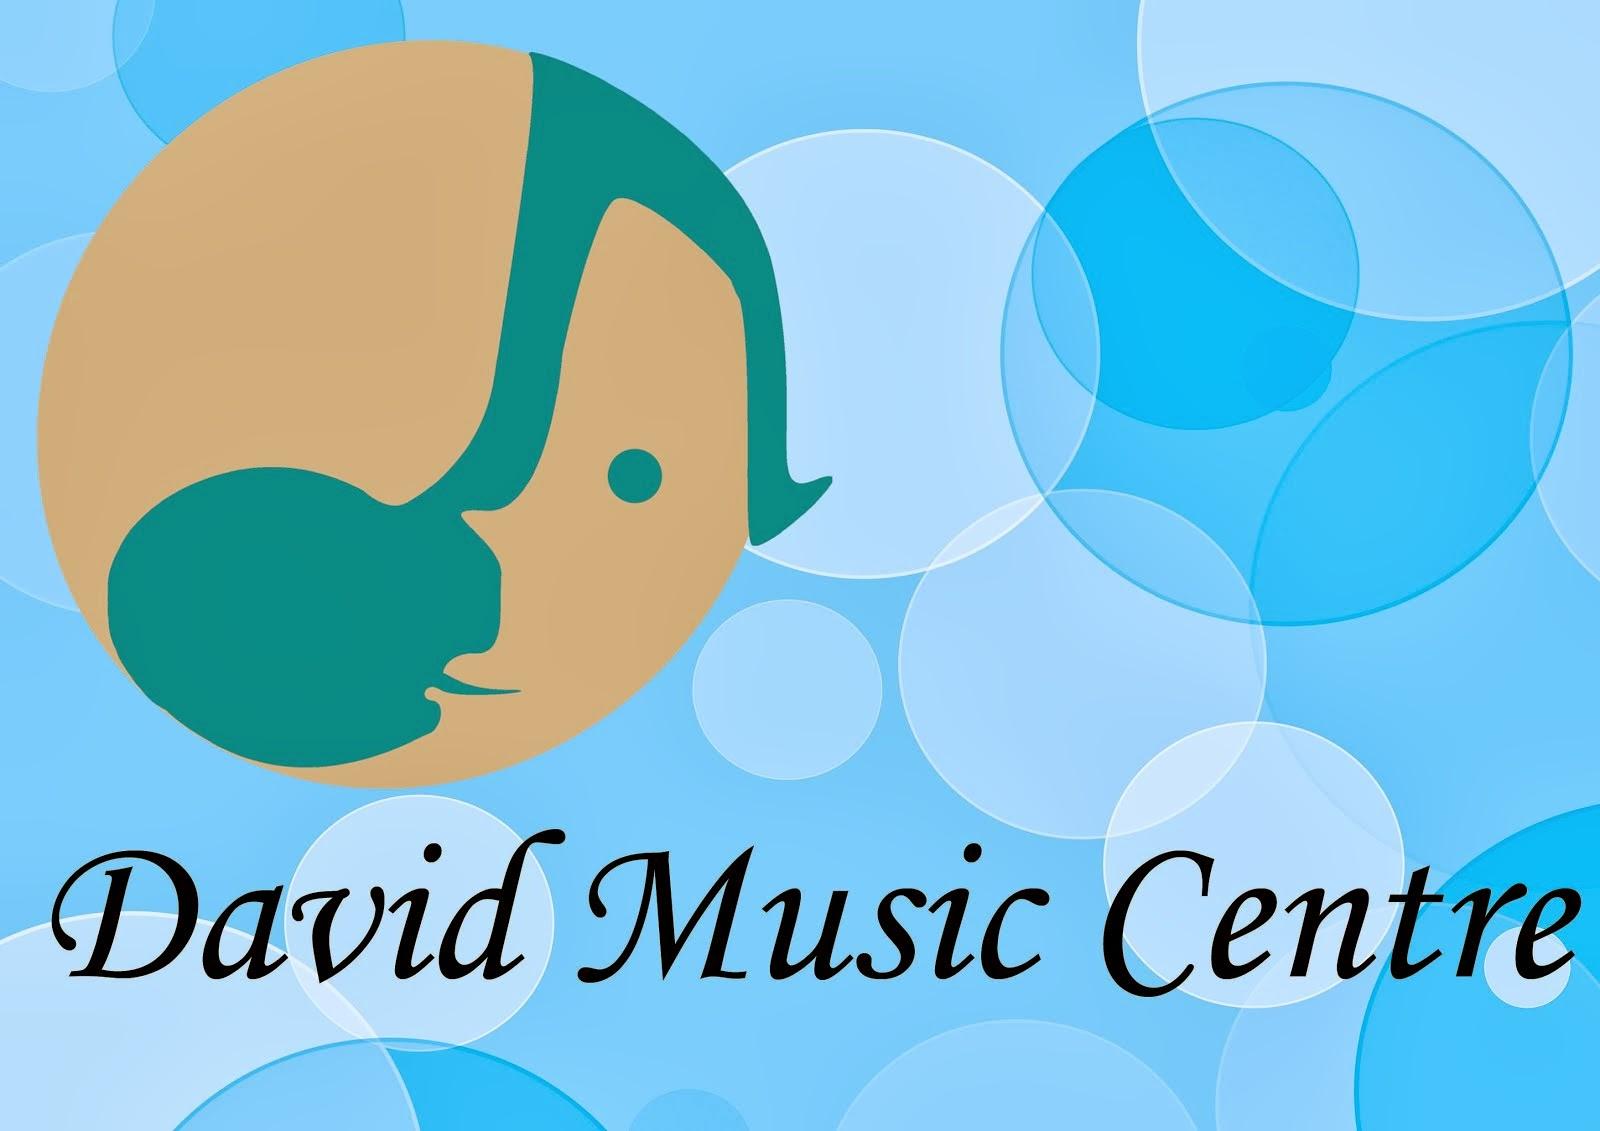 David Music Center